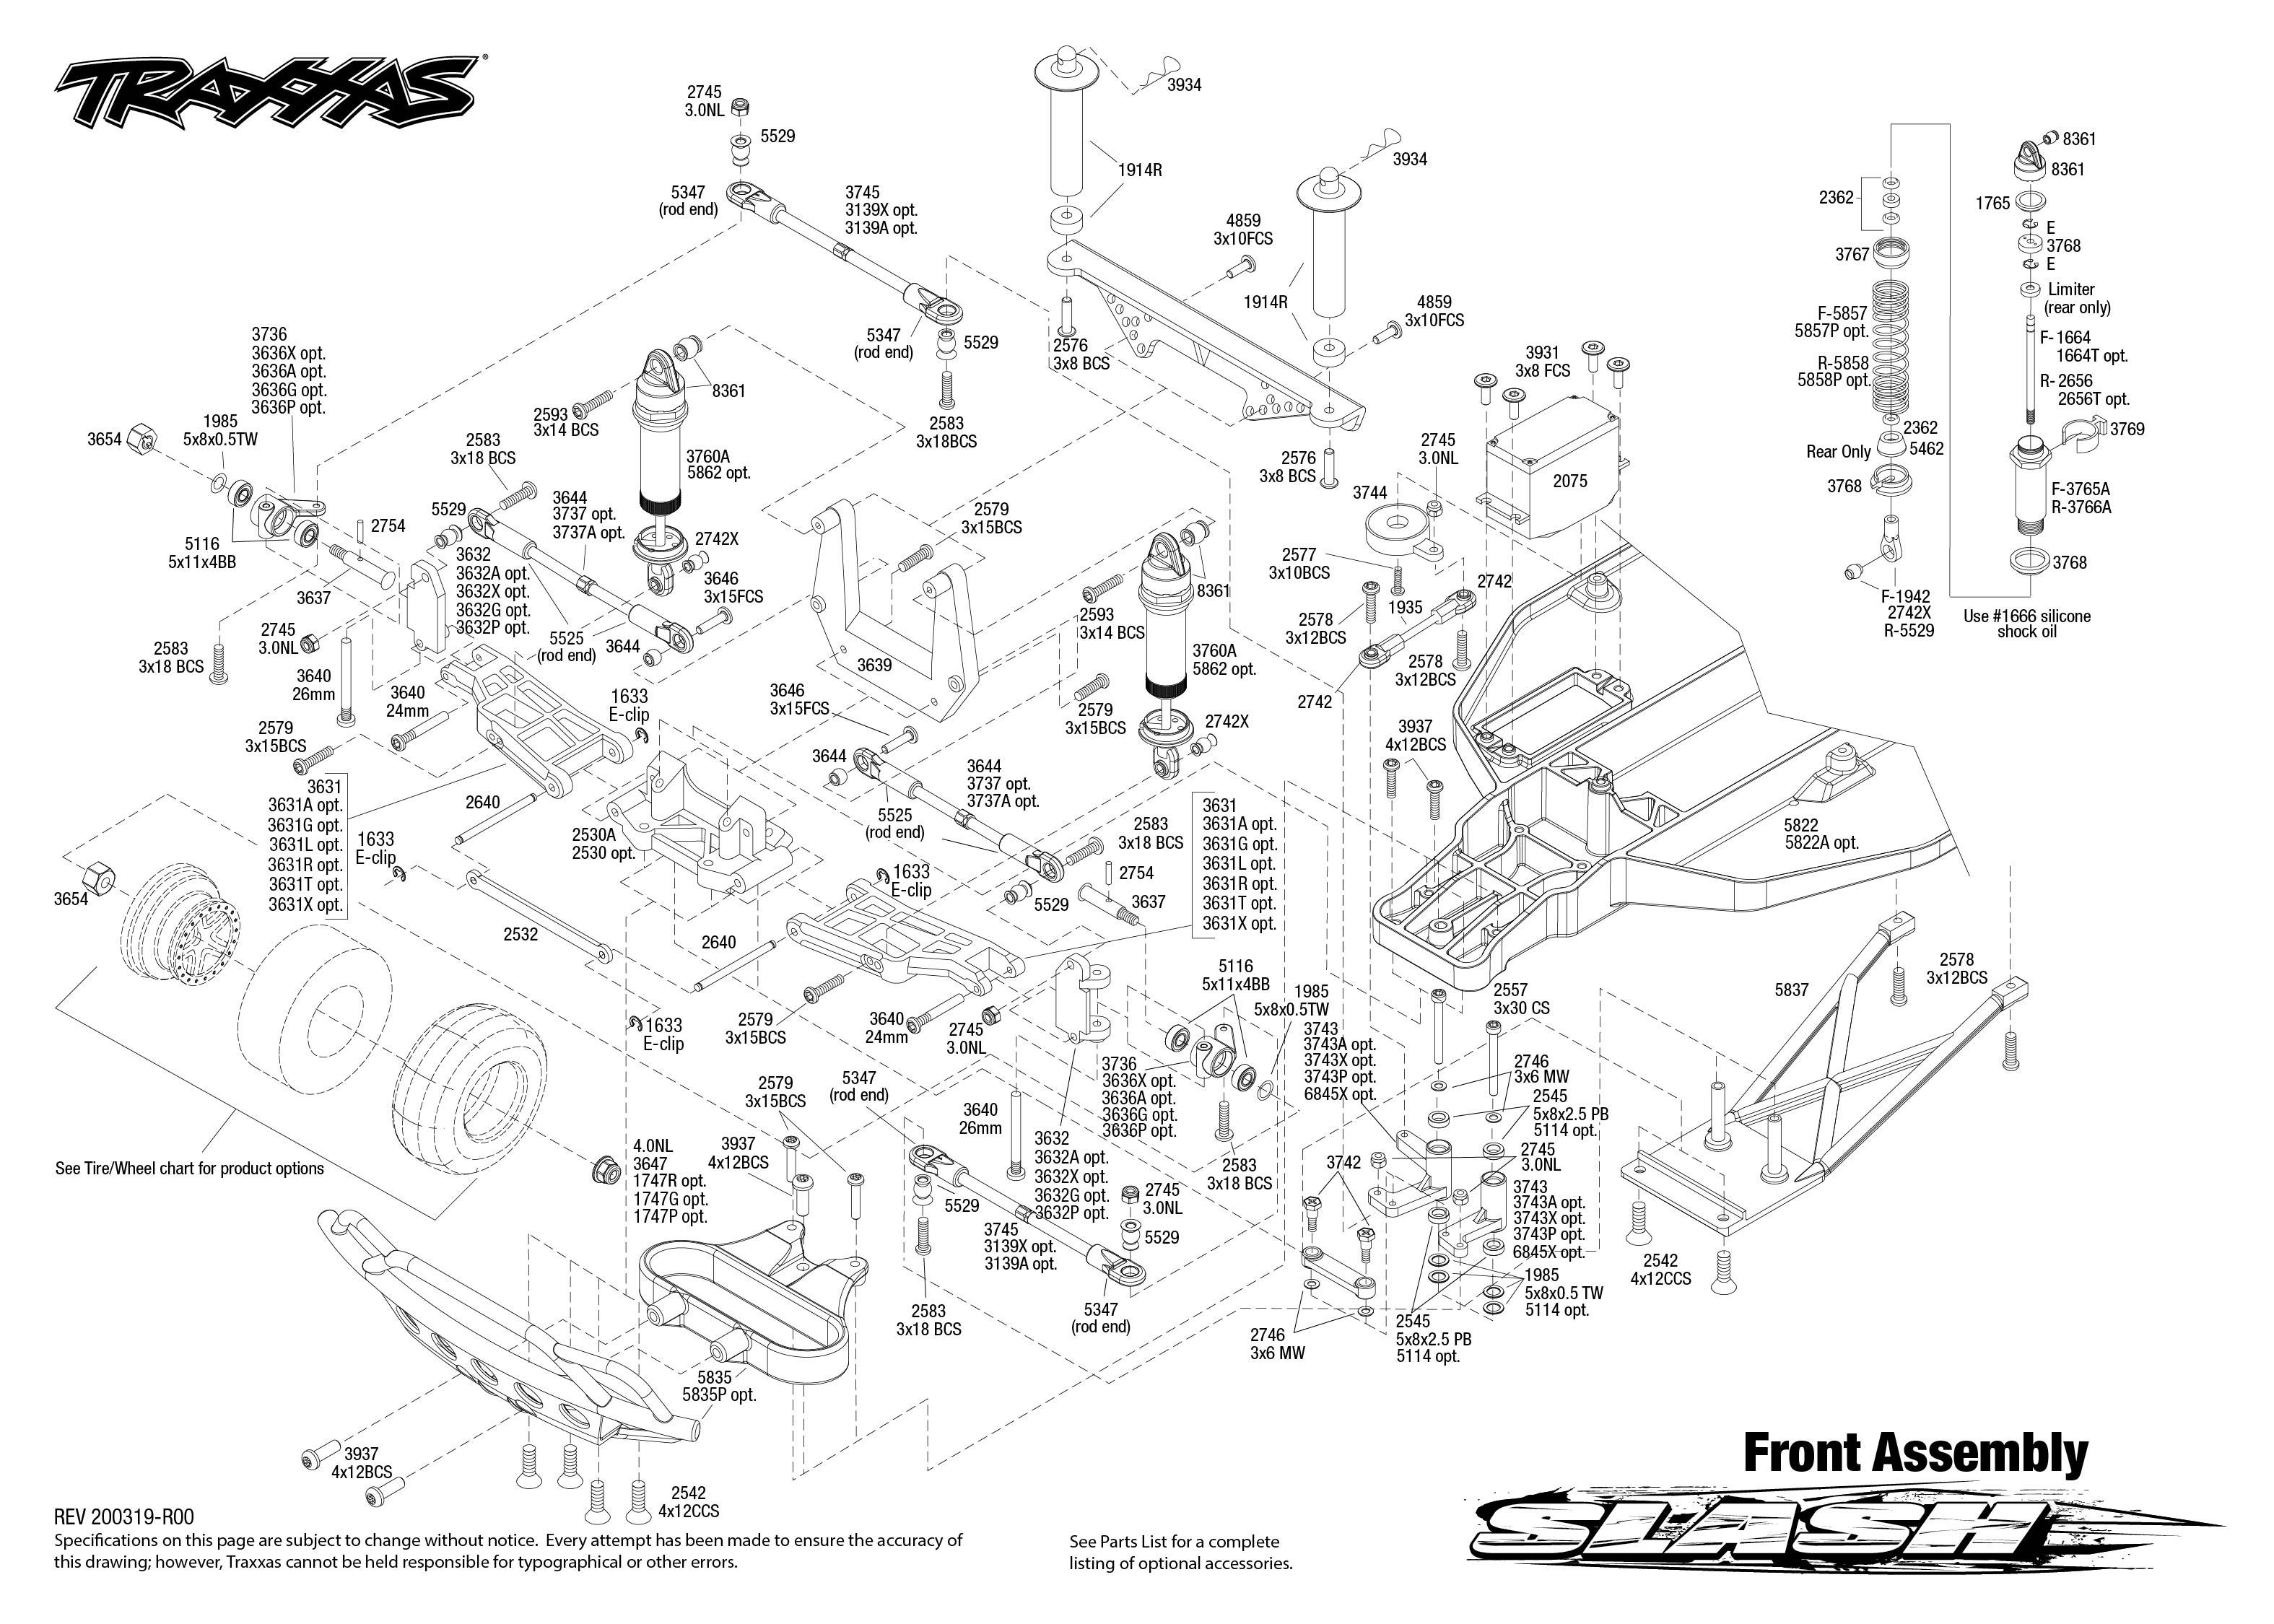 Traxxas Slash 2WD 1/10 Scale Short Course Racing Truck Kit